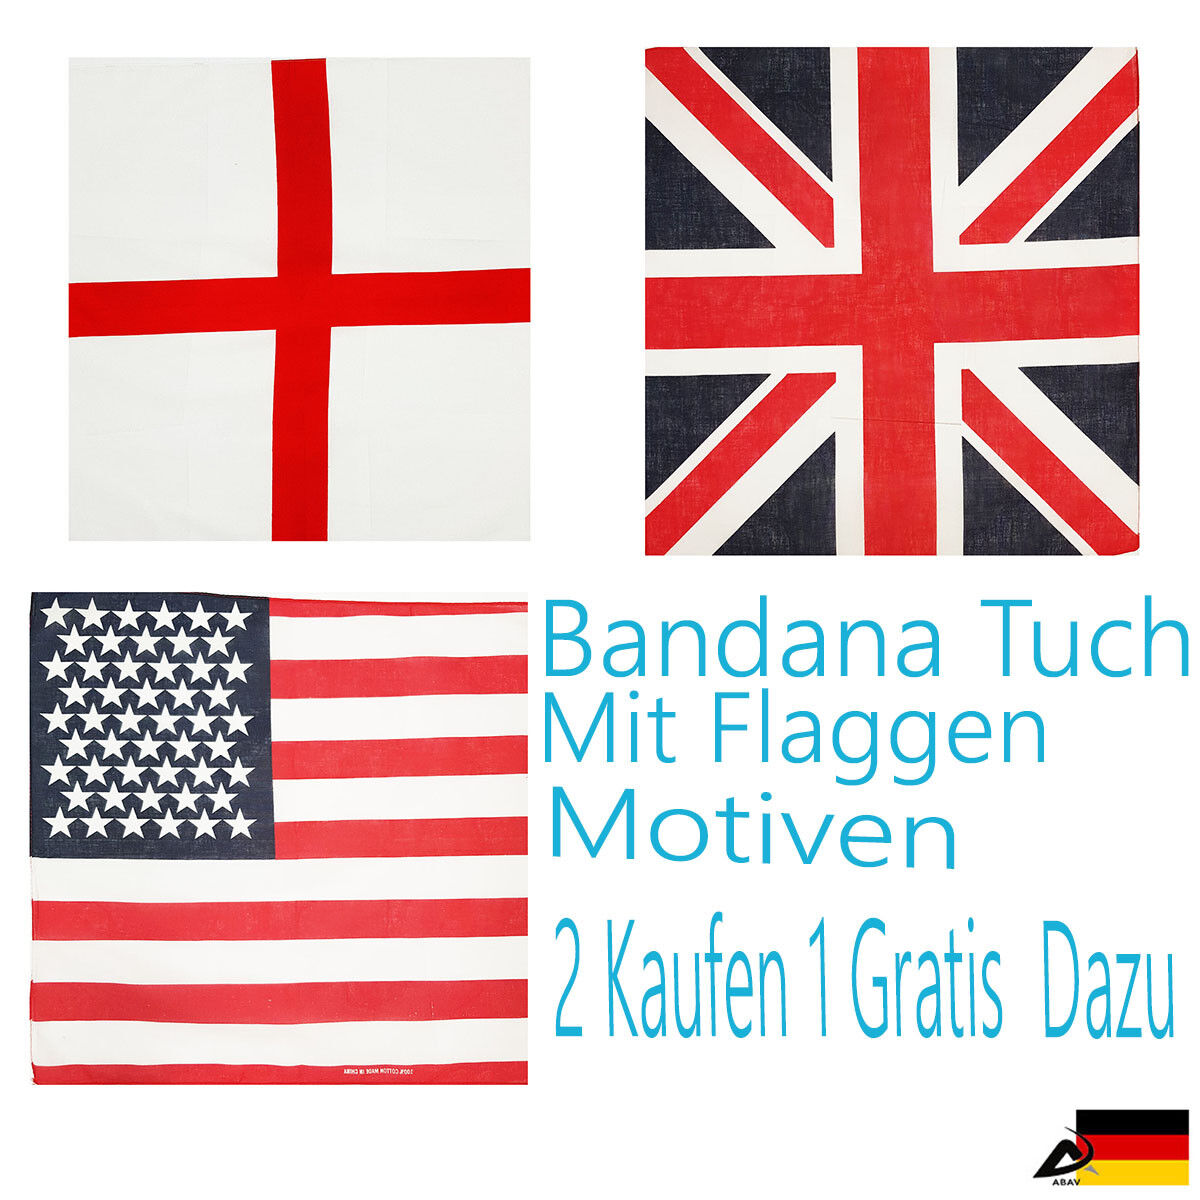 Bandana Flagge Motiven USA, Union Jack, England Handtuch Bikertuch Kopftuch B2